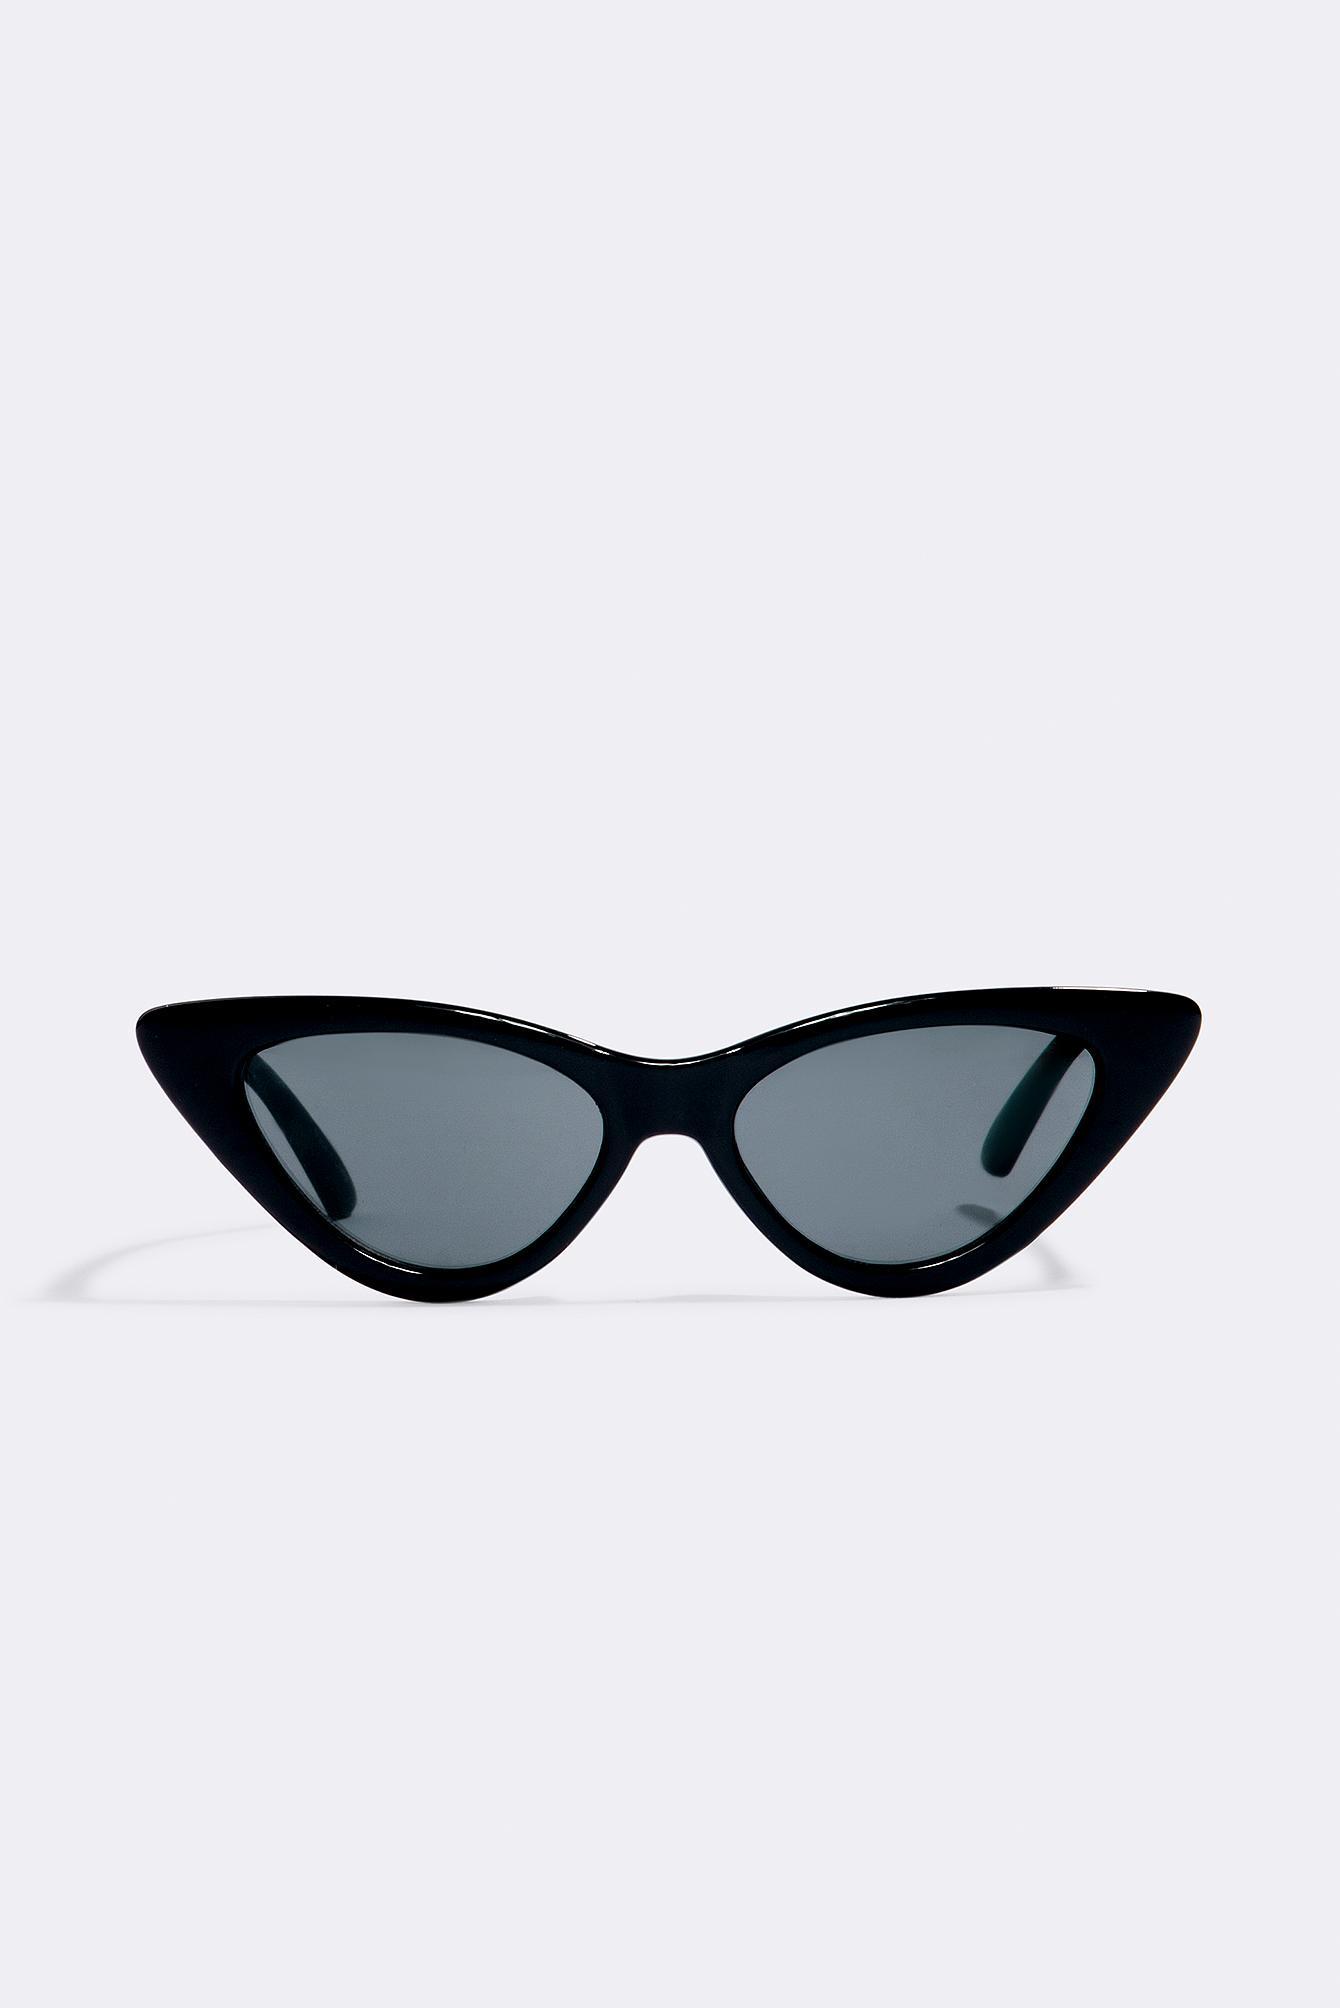 NA-KD Pointy Cat Eye Sunglasses Black